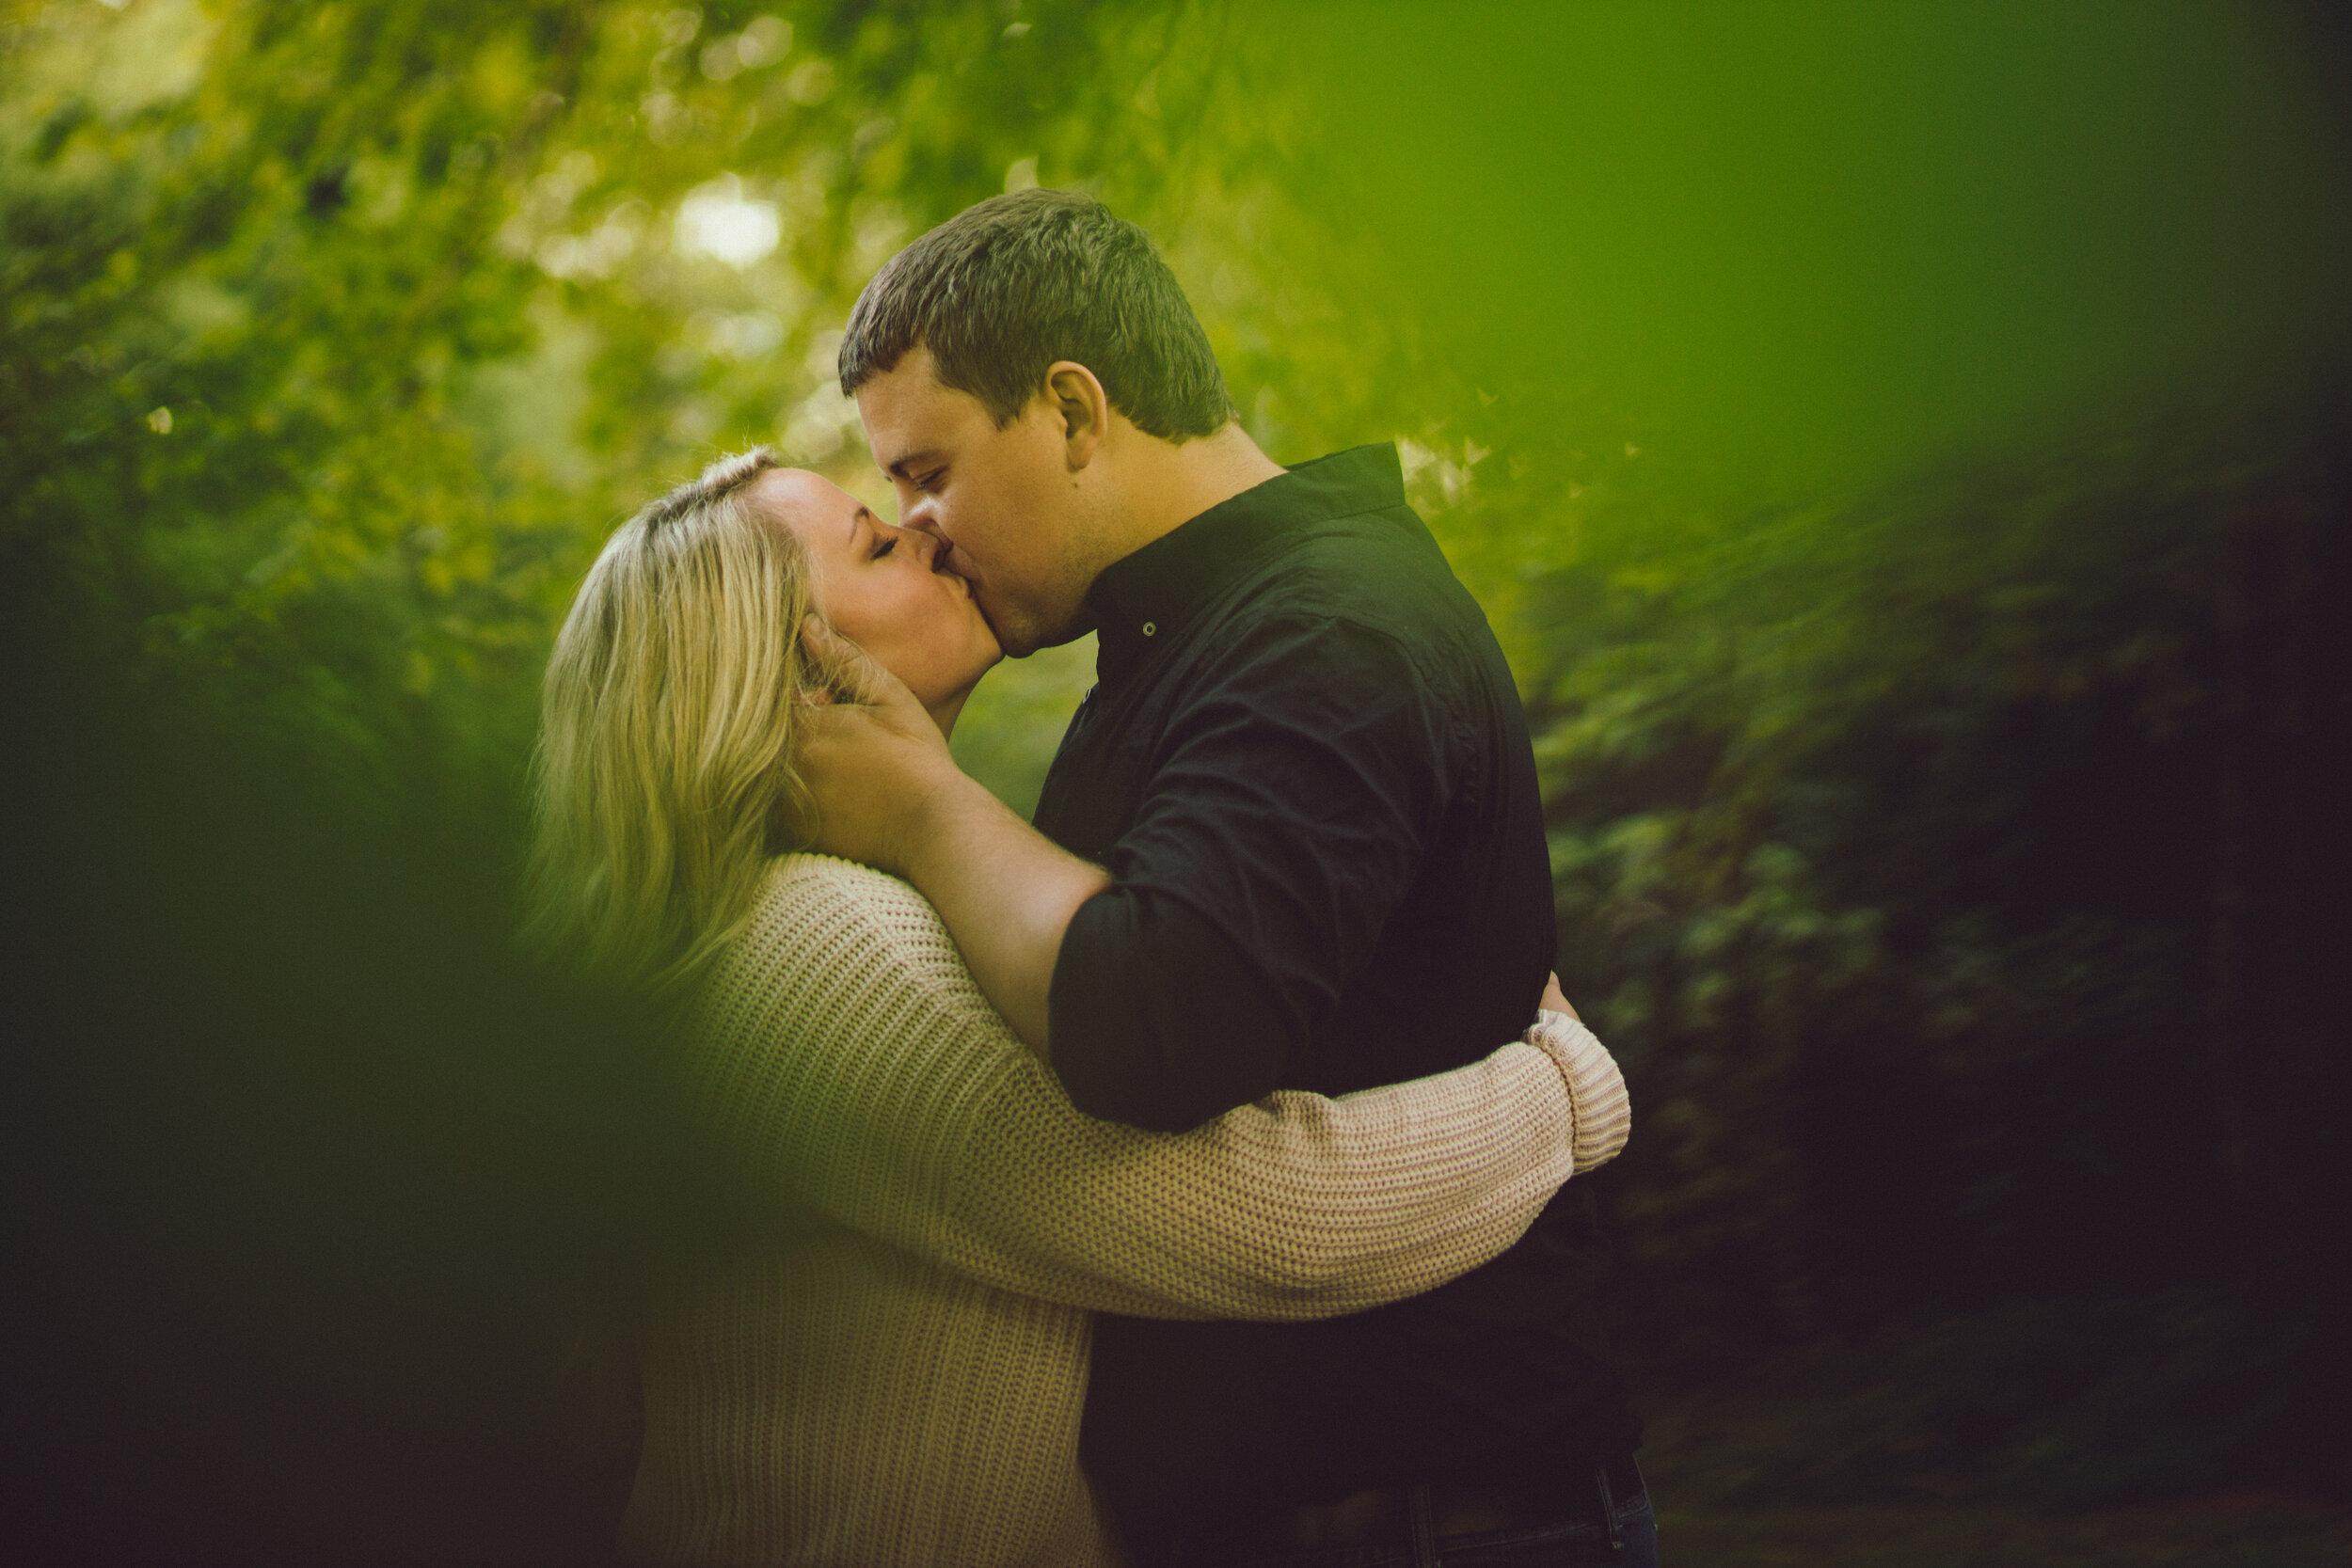 cora & adam - an engagement @ lafayette park